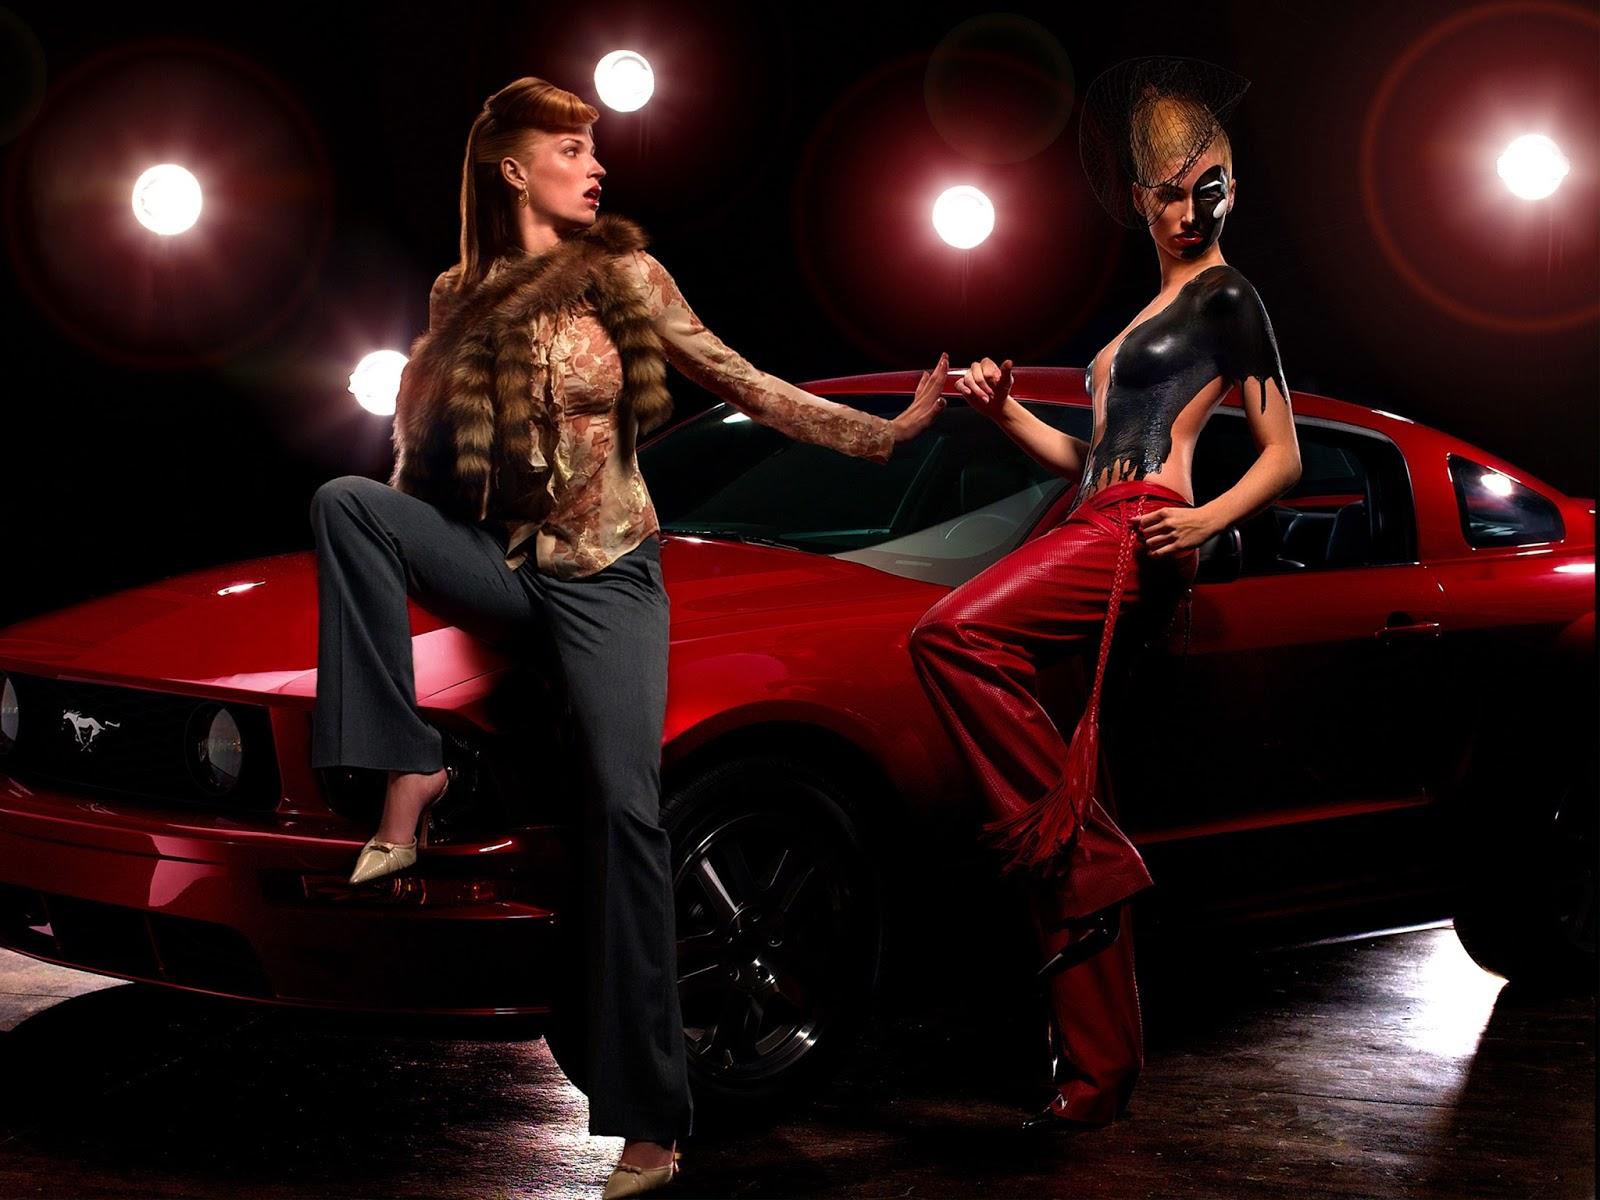 next top model blog antm c3 alter egos with ford mustang. Black Bedroom Furniture Sets. Home Design Ideas